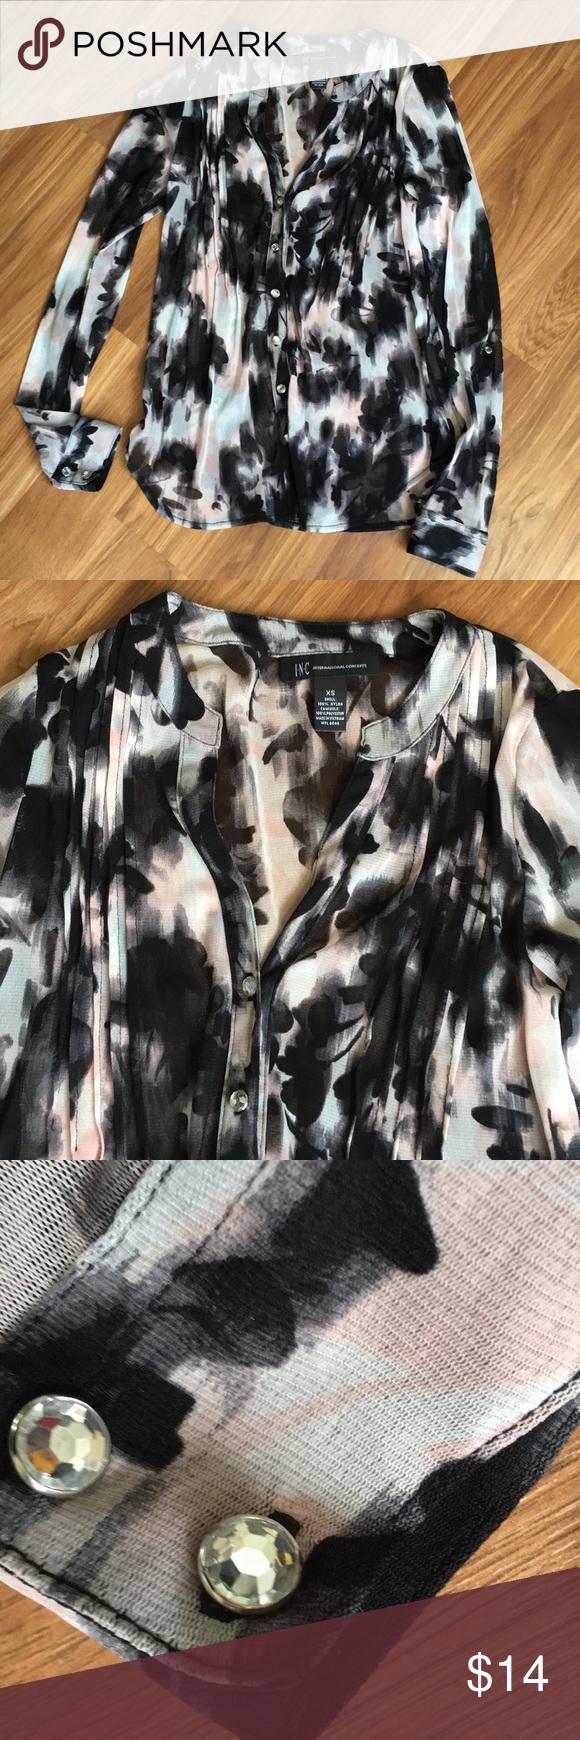 1b86a13de84f9 Semi Sheer INC Long Sleeve Floral Blouse SZ XS Nylon top